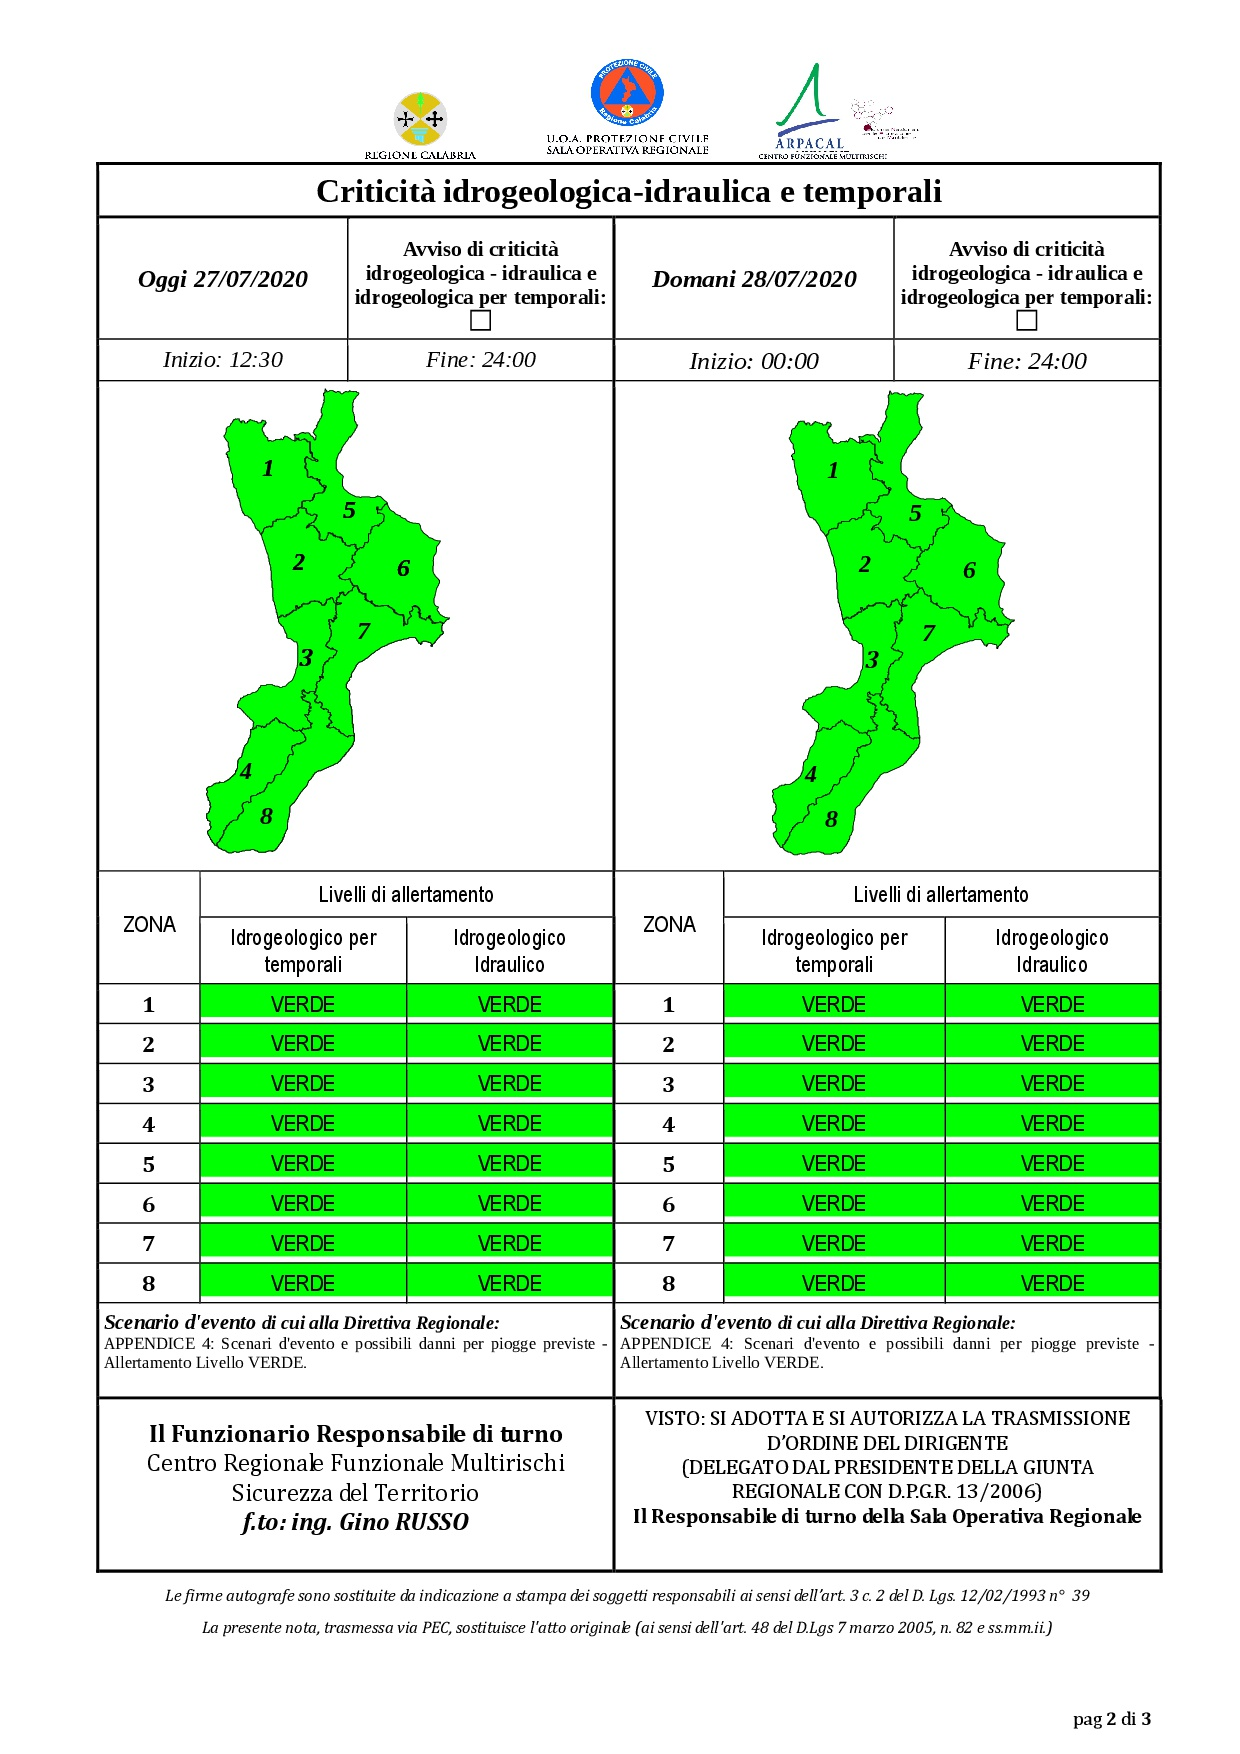 Criticità idrogeologica-idraulica e temporali in Calabria 27-07-2020